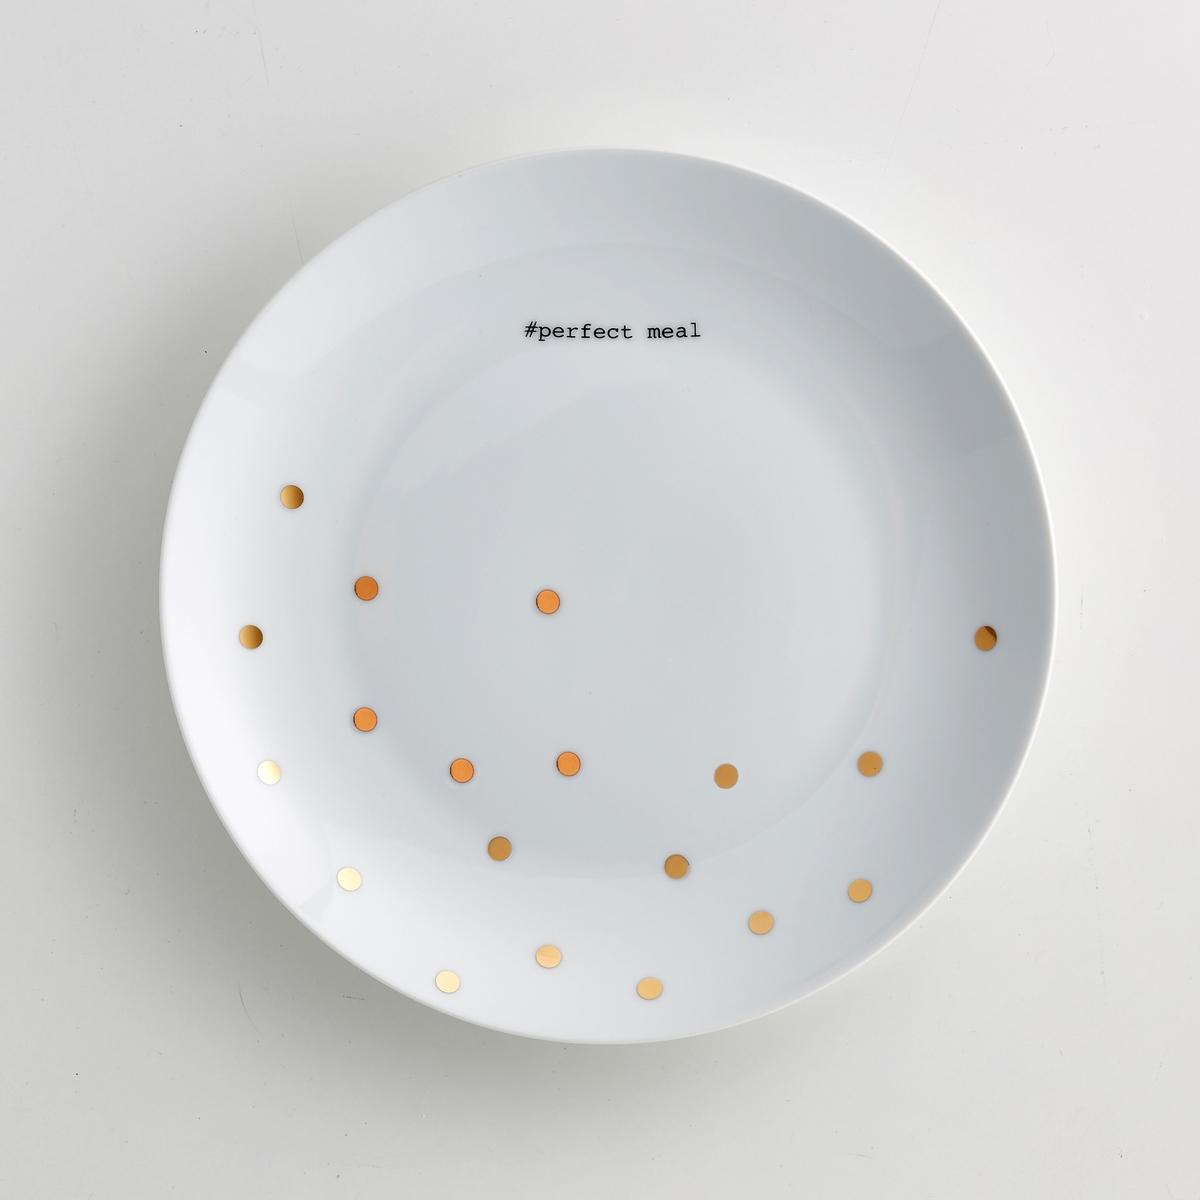 Комплект из 4 плоских тарелок из фарфора, KUBLER комплект из 4 колец для салфеток kubler